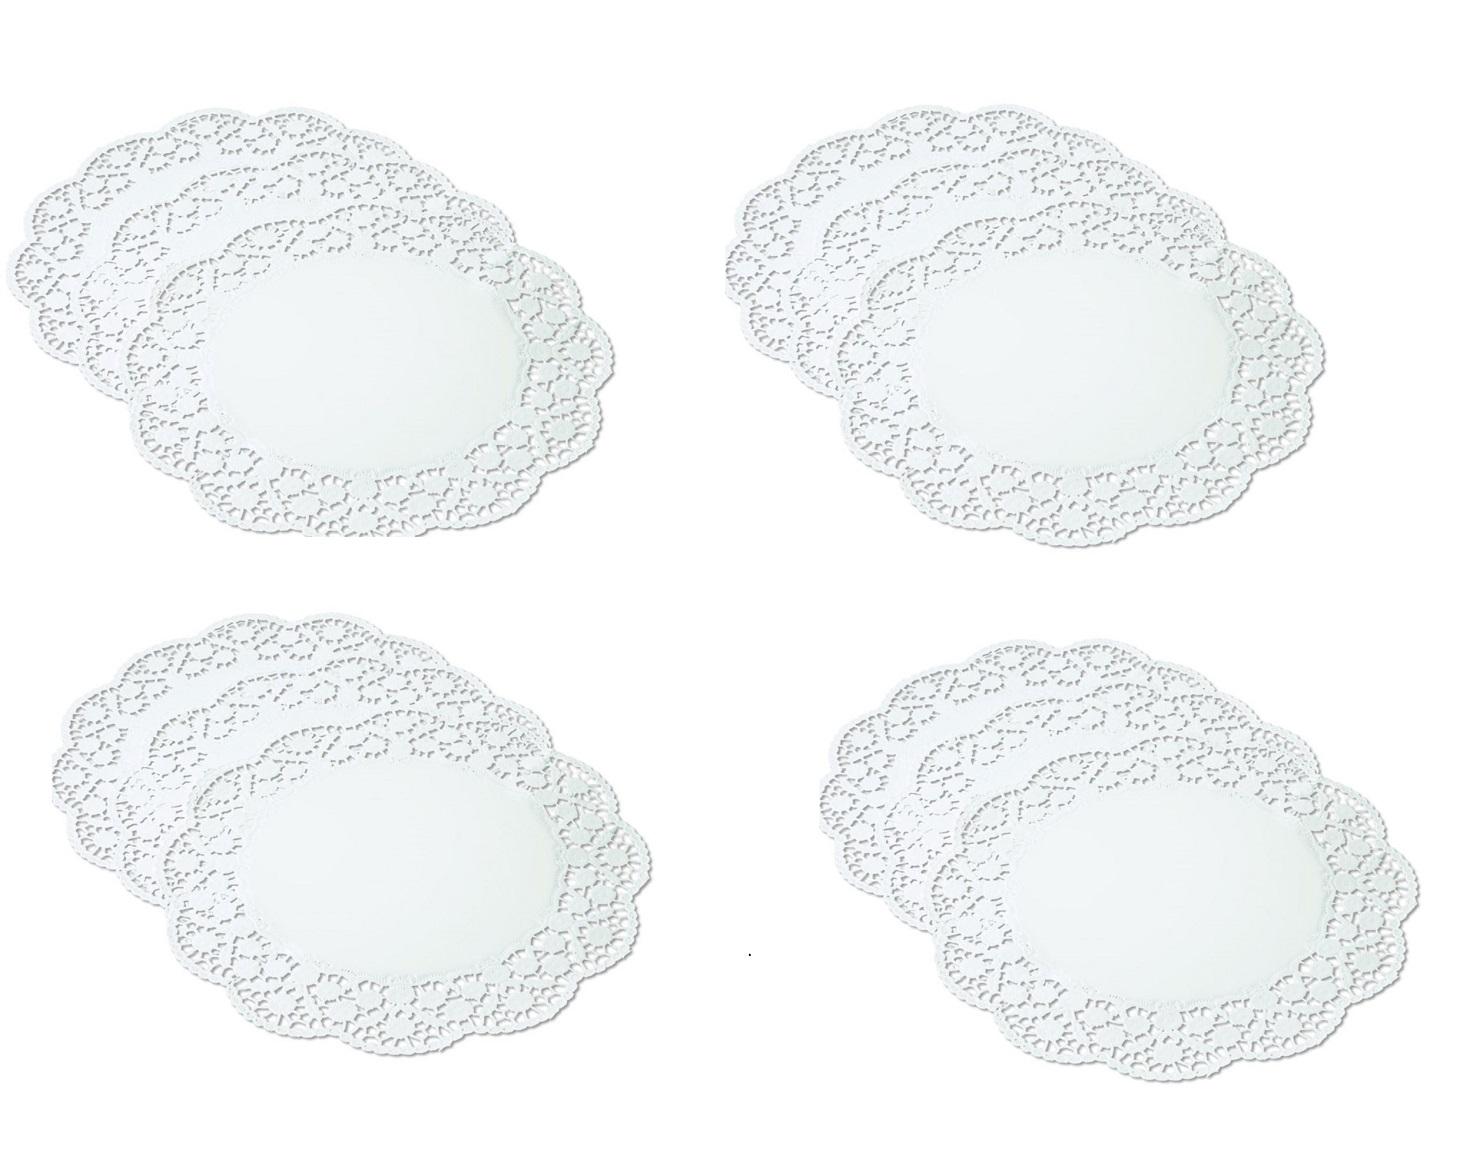 Онлайн каталог PROMENU: Набор салфеток бумажных для торта Kaiser Backform PATISSERIE, длина 36 см, бумага, белый, 12 штук                               23 0076 9097